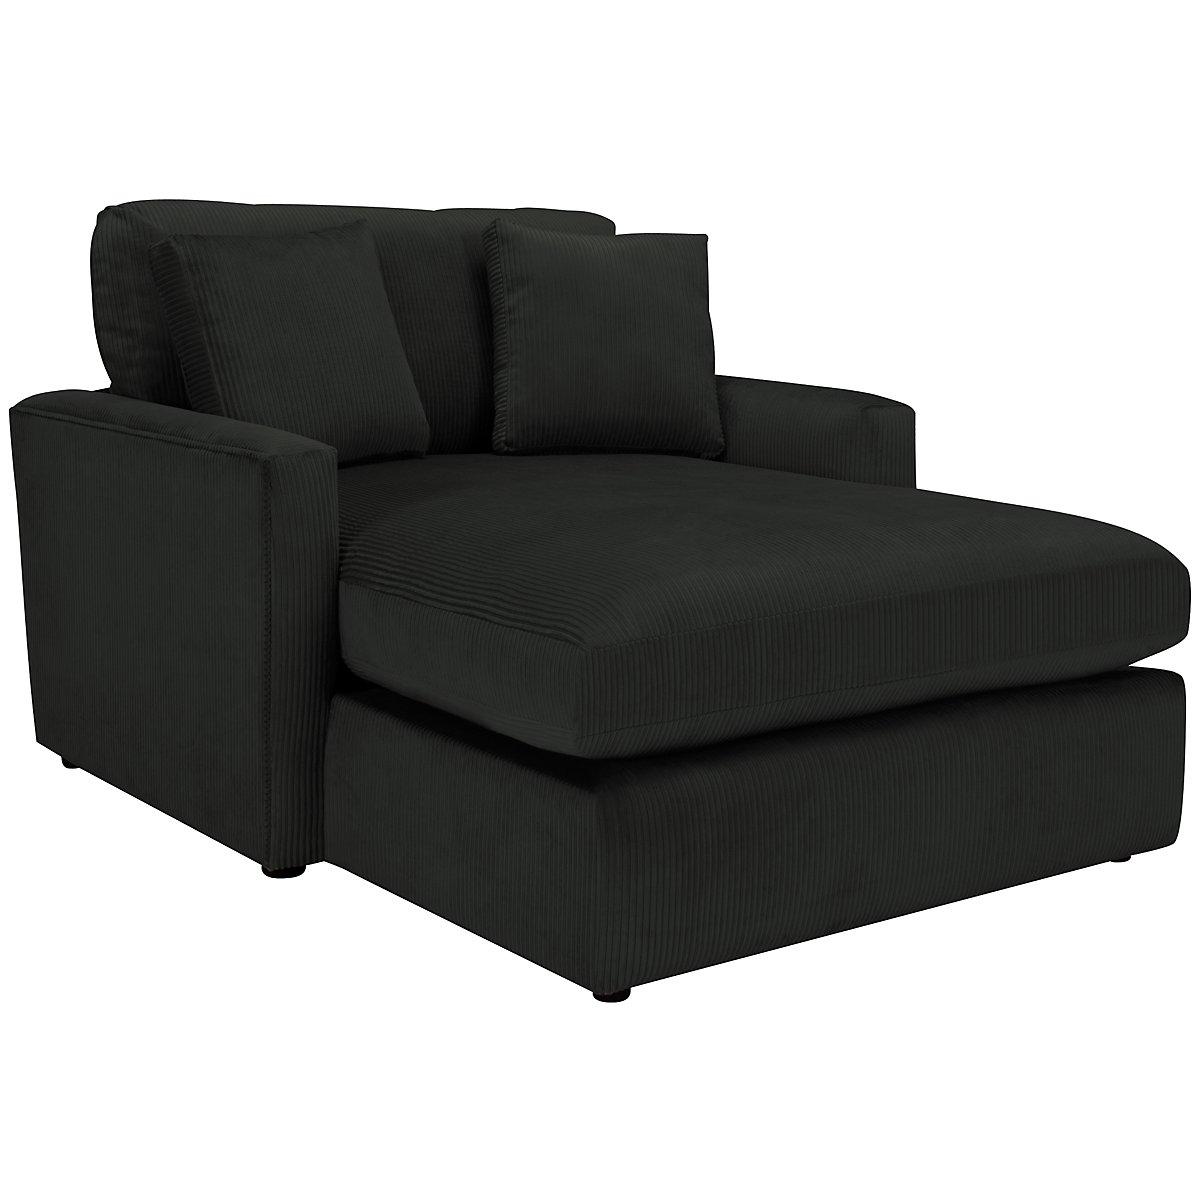 Tara2 Dark Gray Microfiber Chaise